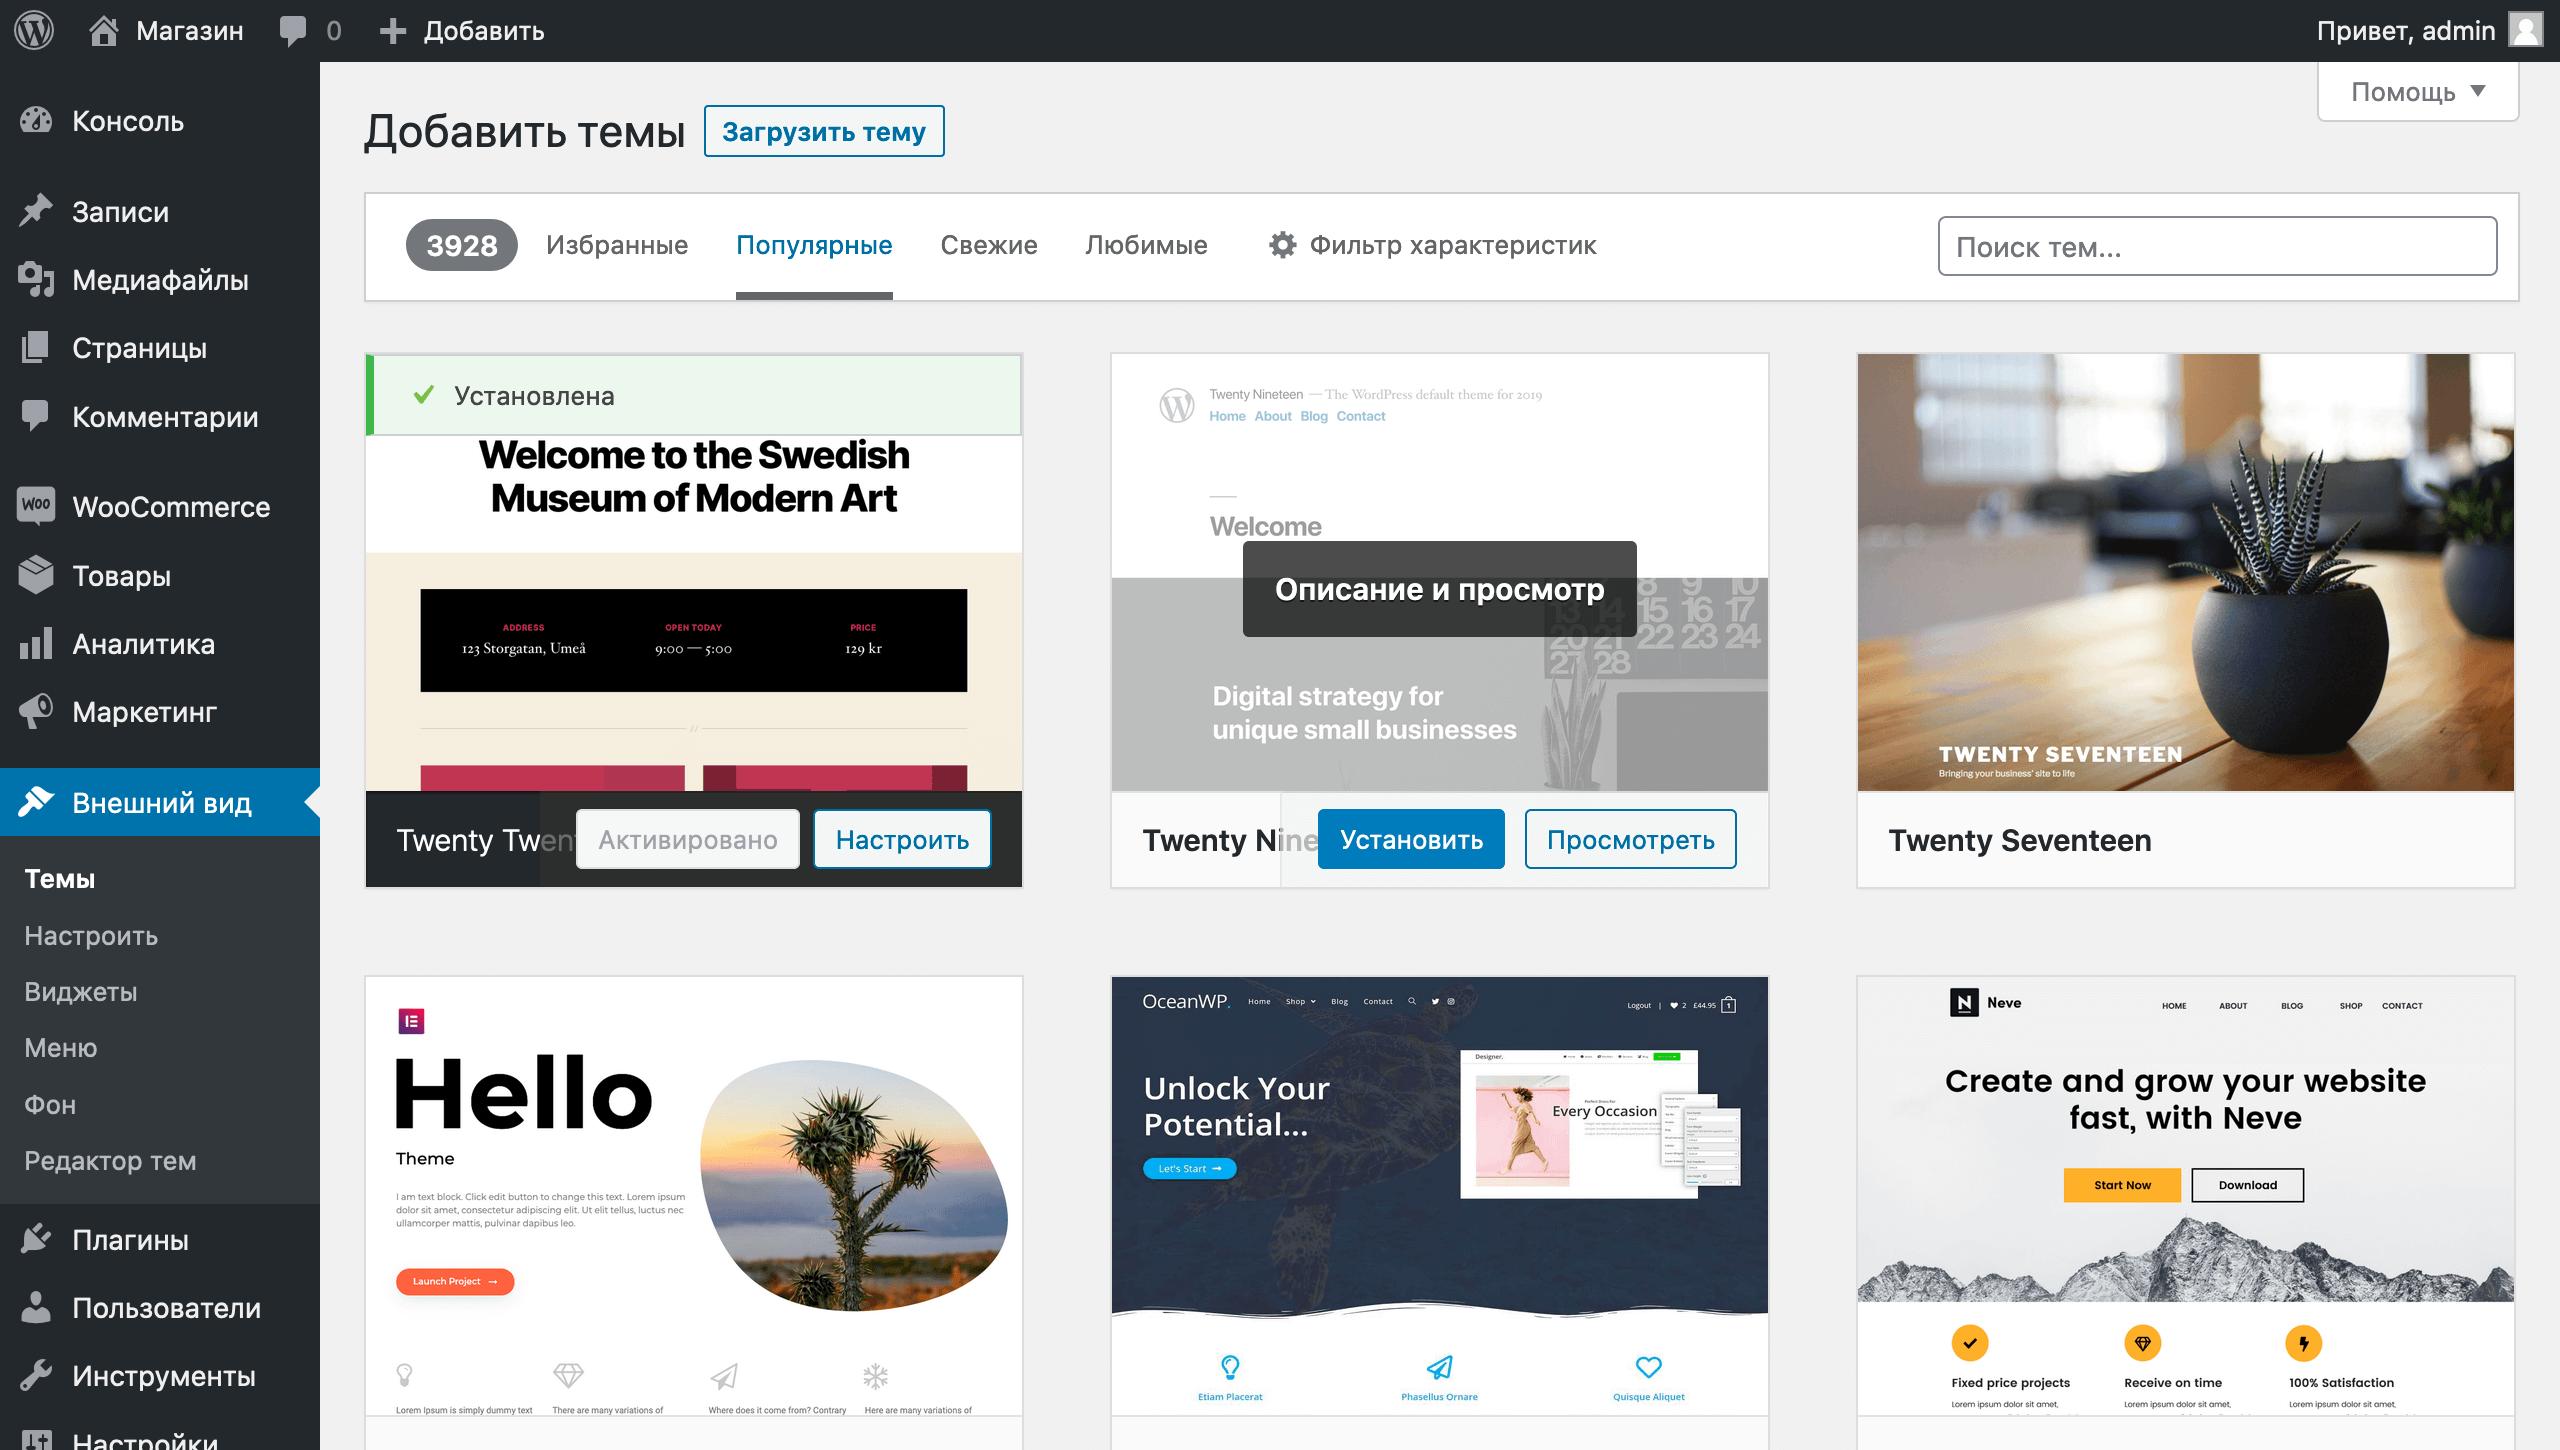 Создание интернет-магазина на WordPress: библиотека тем